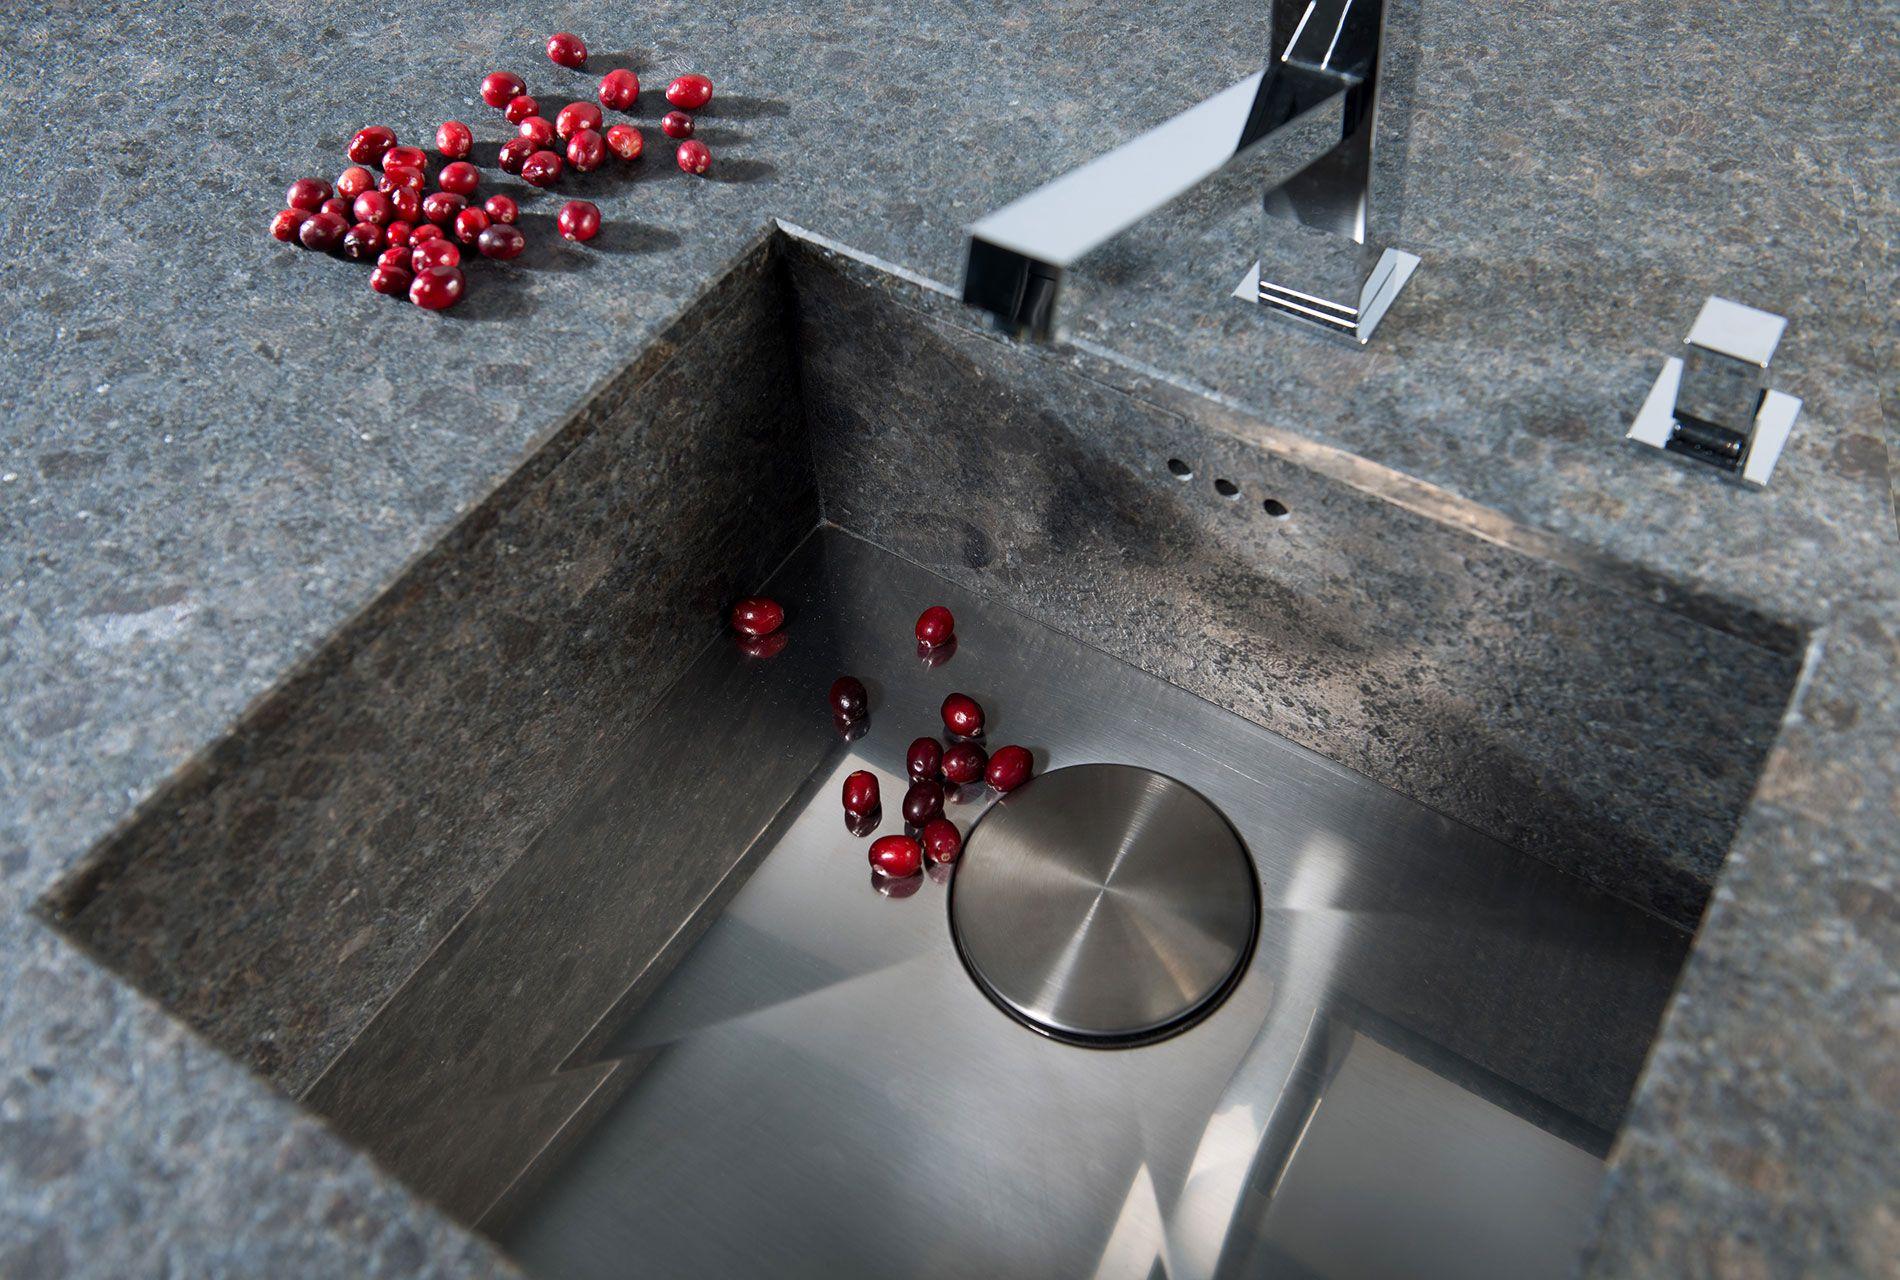 Naturstein, woher kommst du? | Granit Arbeitsplatten | Pinterest ...